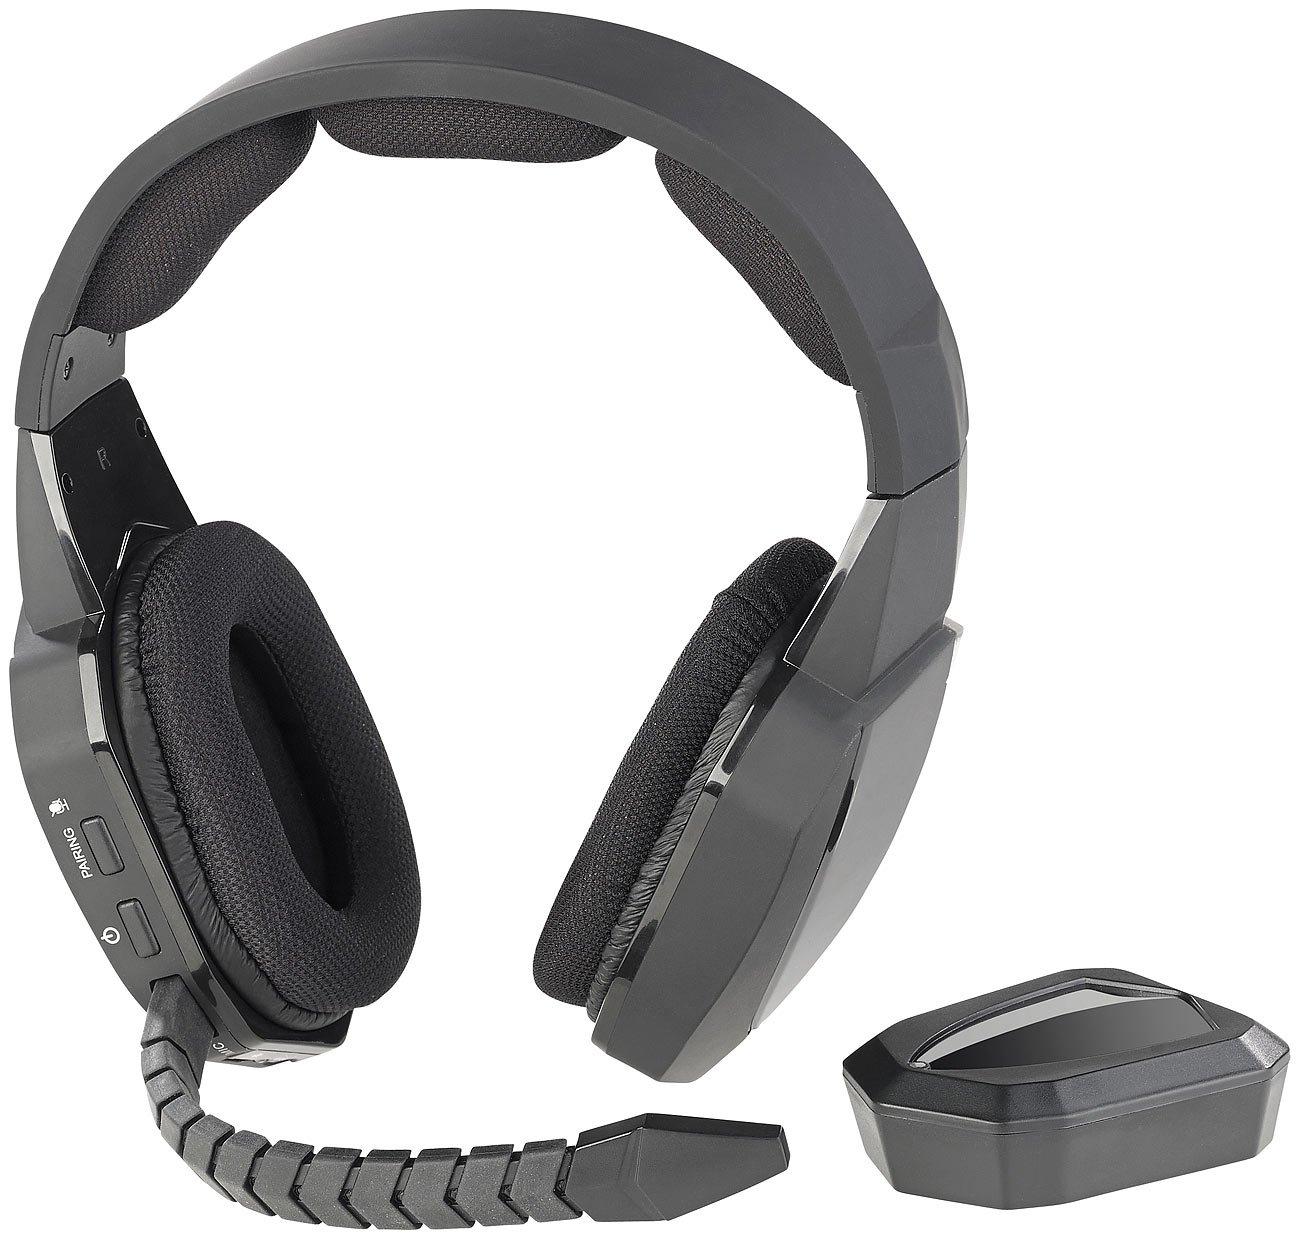 Auvisio Gaming de auriculares inalámbricos: inalámbrico gaming de Juego de auriculares inalámbrico con Toslink & de 12 horas de batería, 2,4 GHz inalámbrico ...